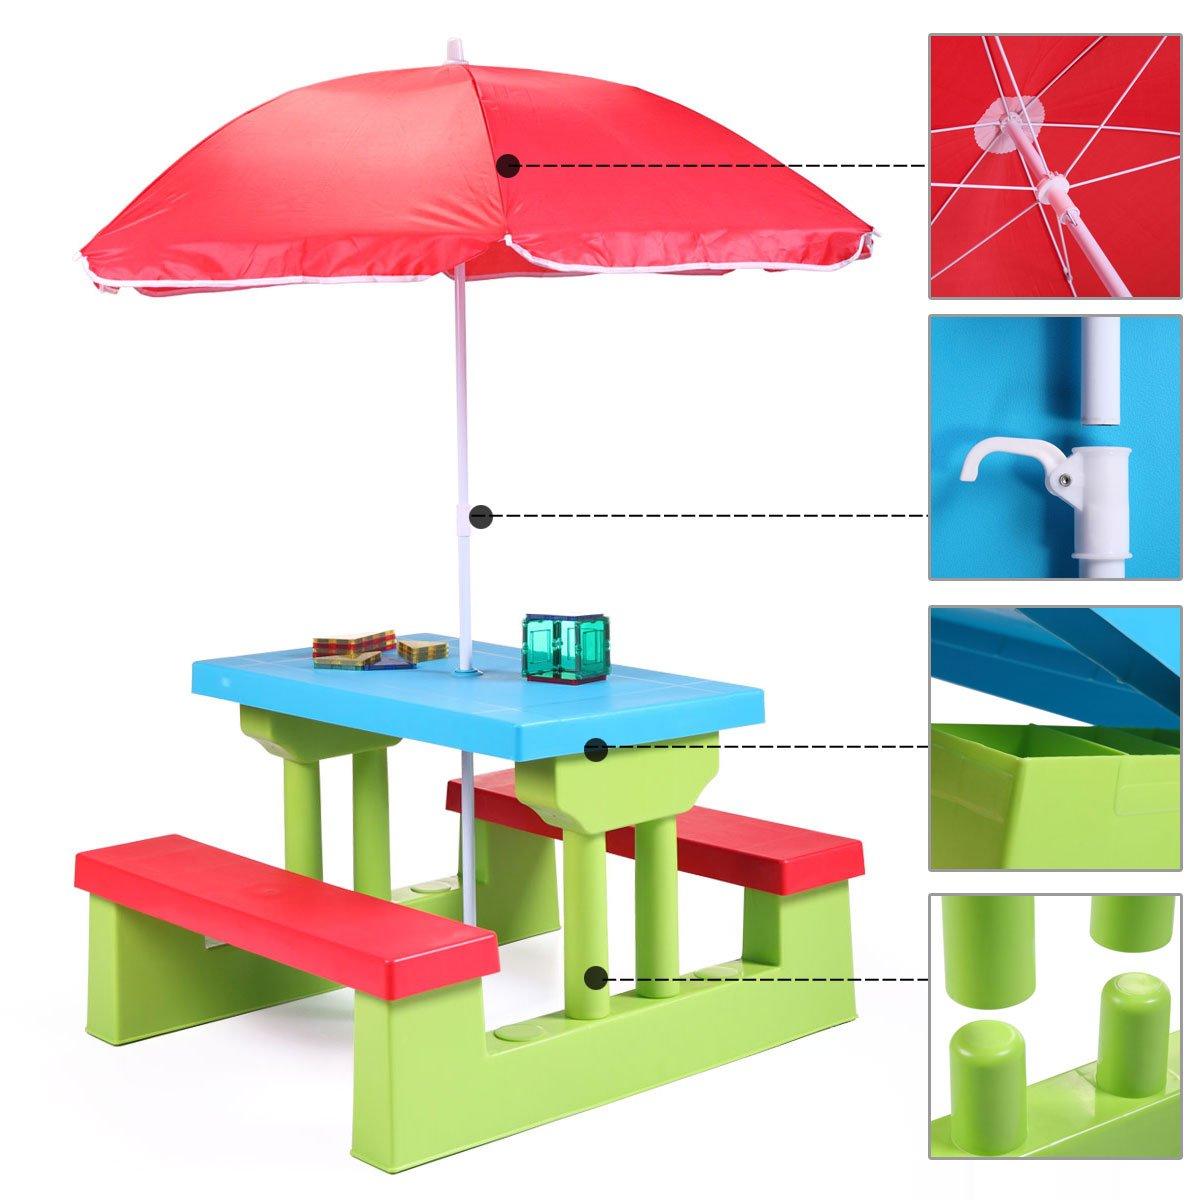 thegreatshopman Kids PicnicTable Set Folding Outdoor Children Set Rainbow Bench w/Umbrella by thegreatshopman